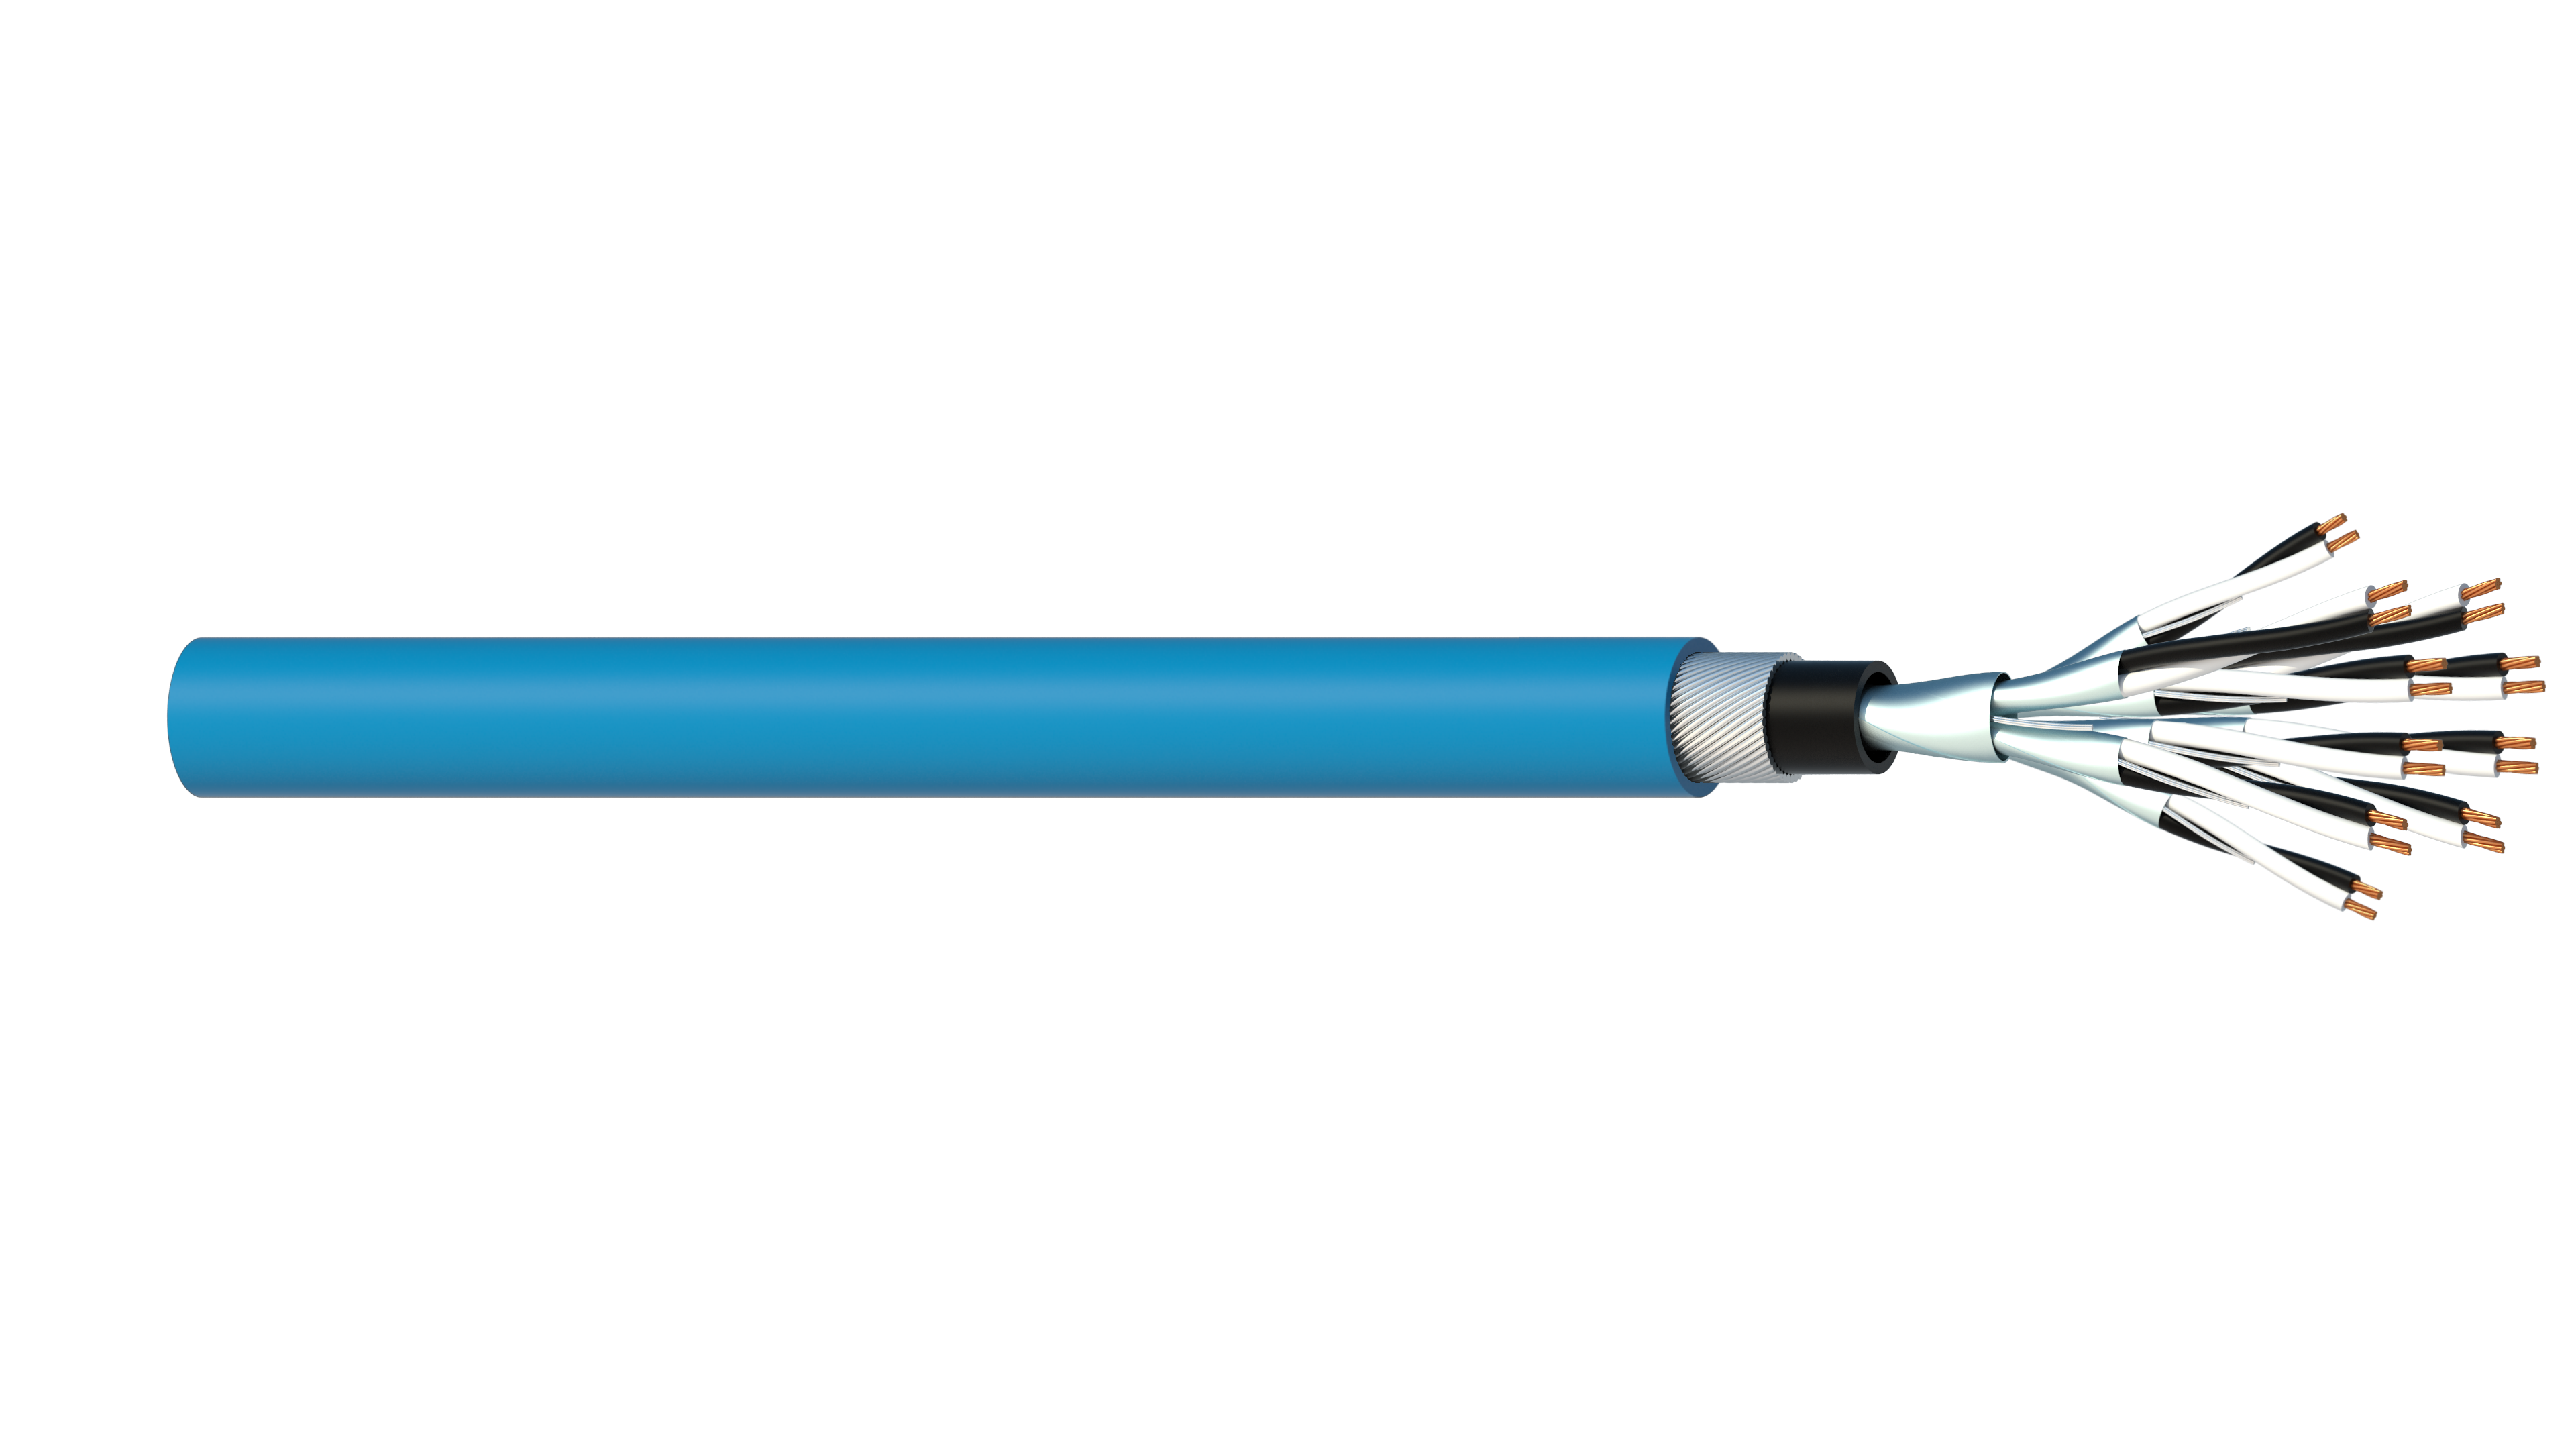 10 Pair 0.5mm2 Cu/PVC/ISOS/PVC/SWA/PVC Maser Instrumentation Cable - Blue Sheath